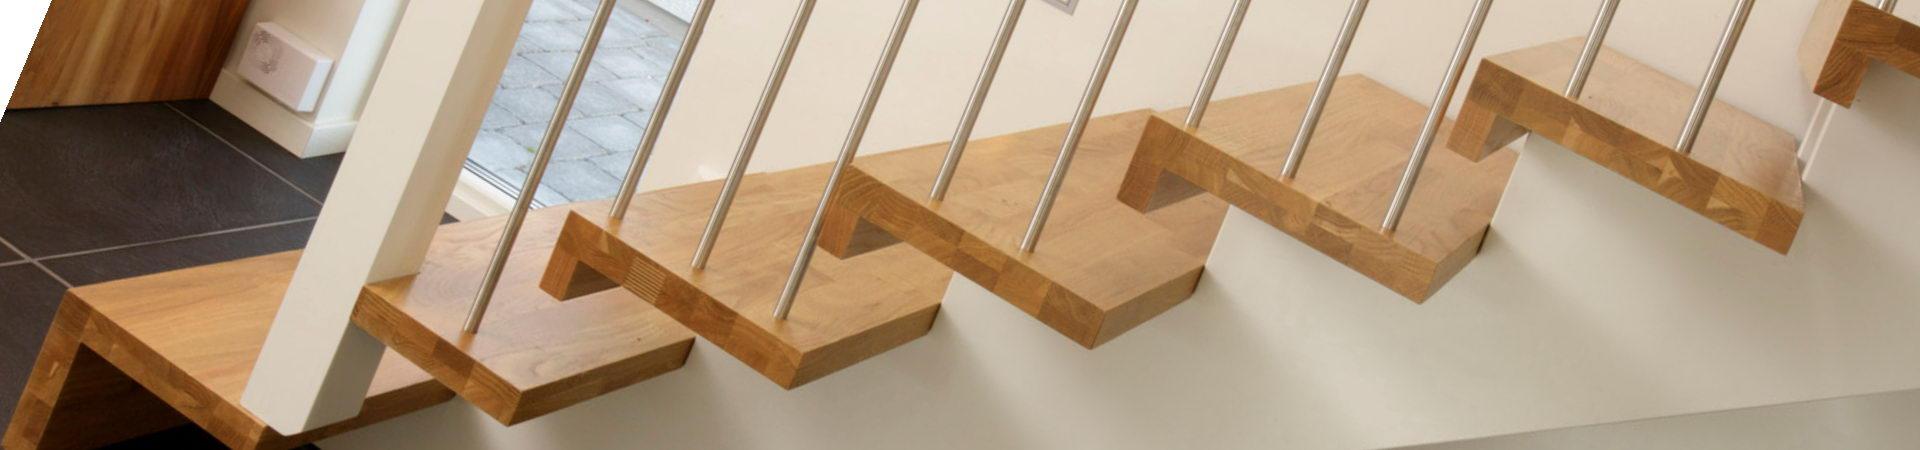 Escaleras de madera para exteriores simple guayubira for Escalera plegable aluminio sodimac